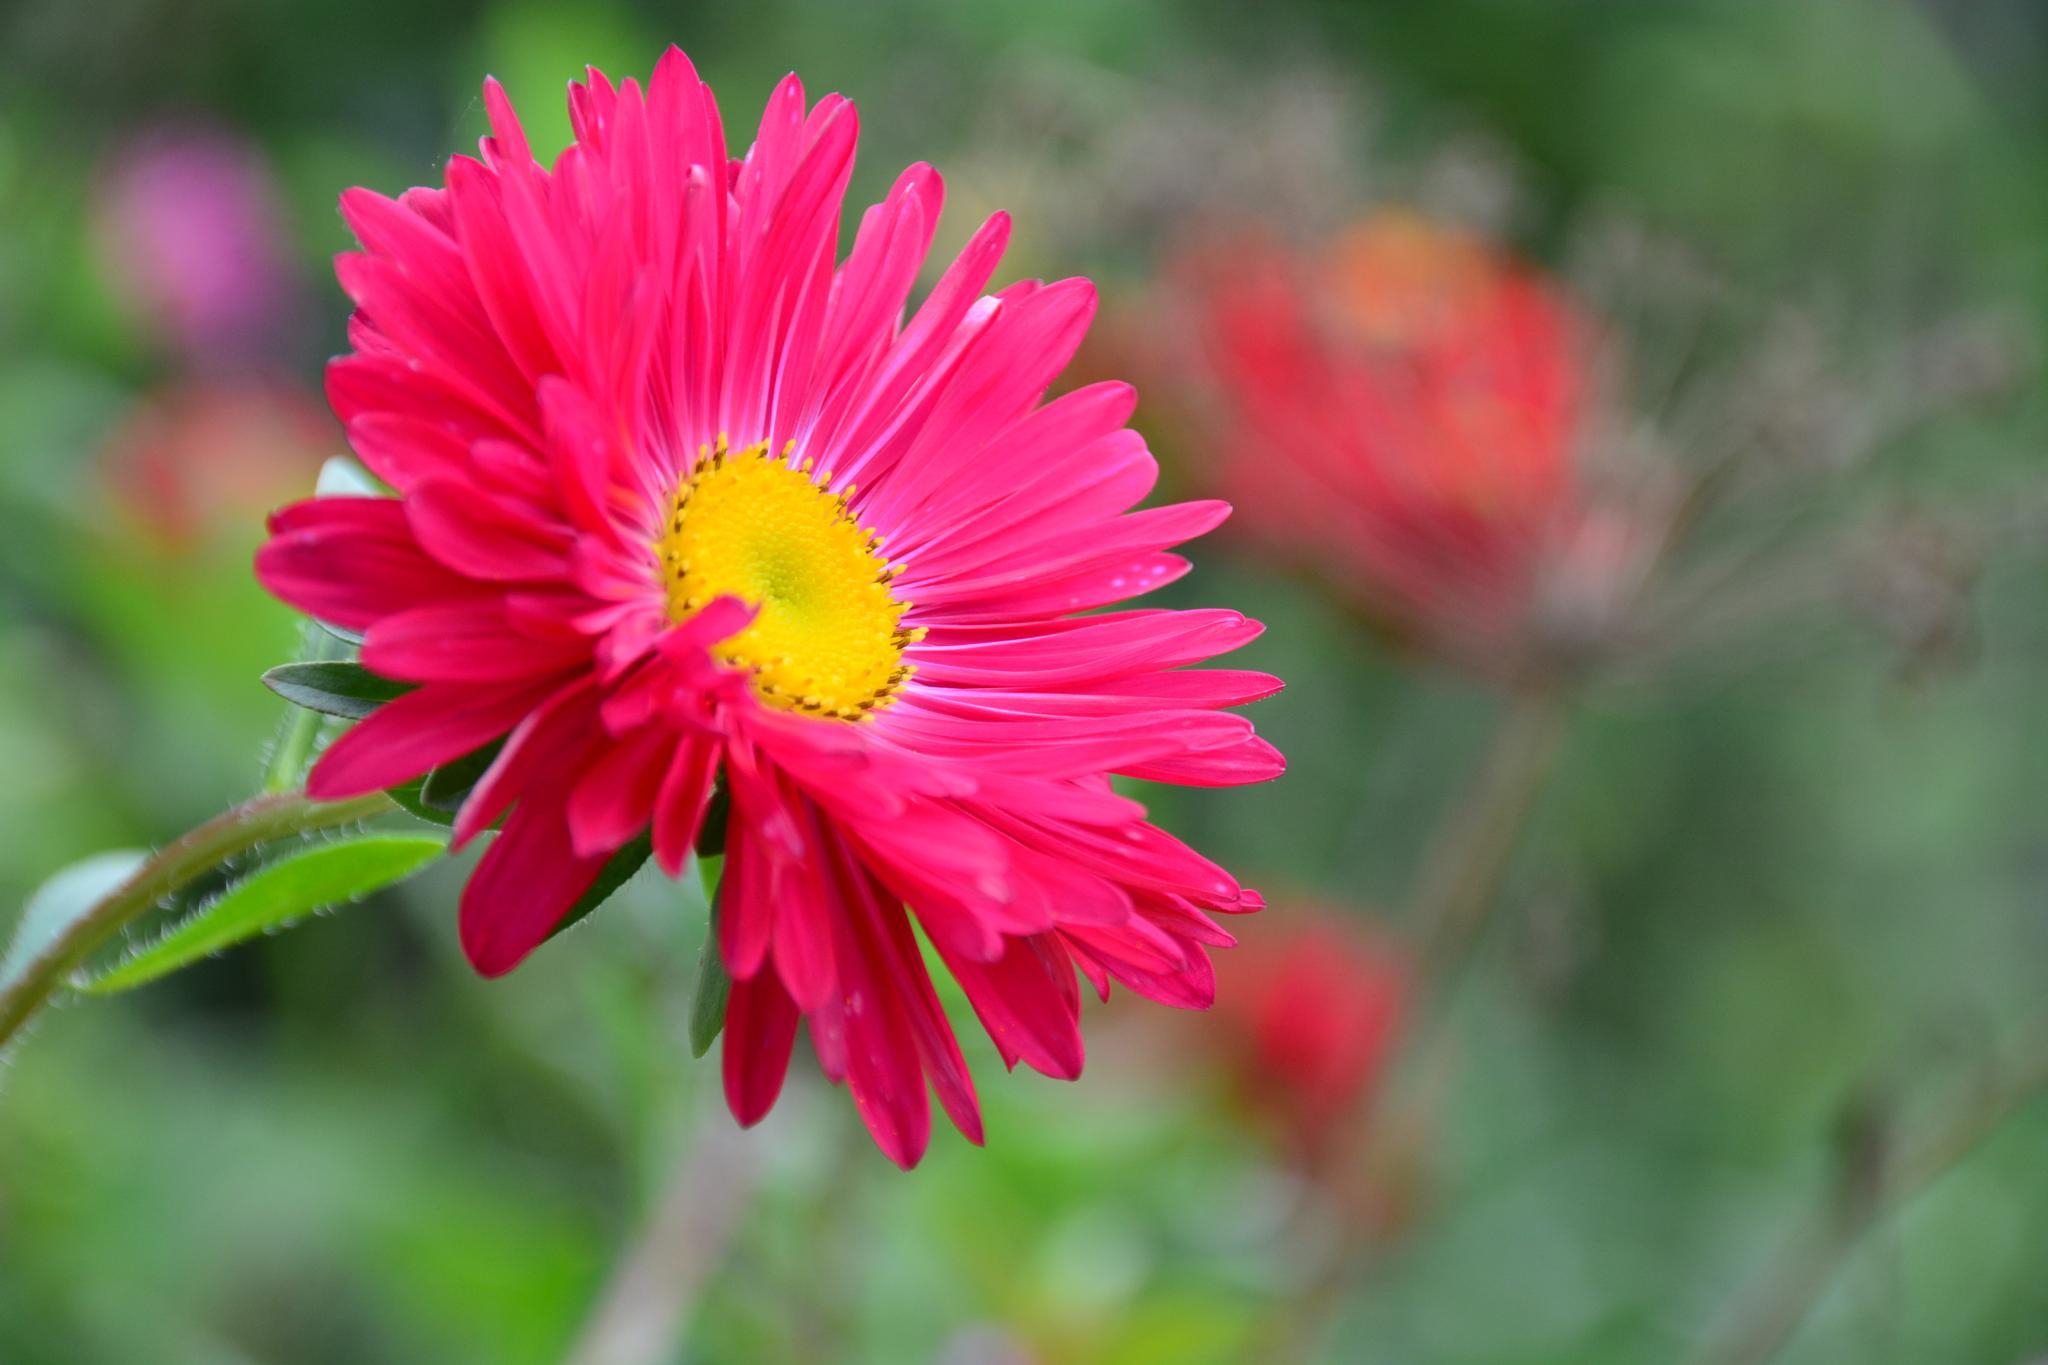 Red flower by Silviu Calistru